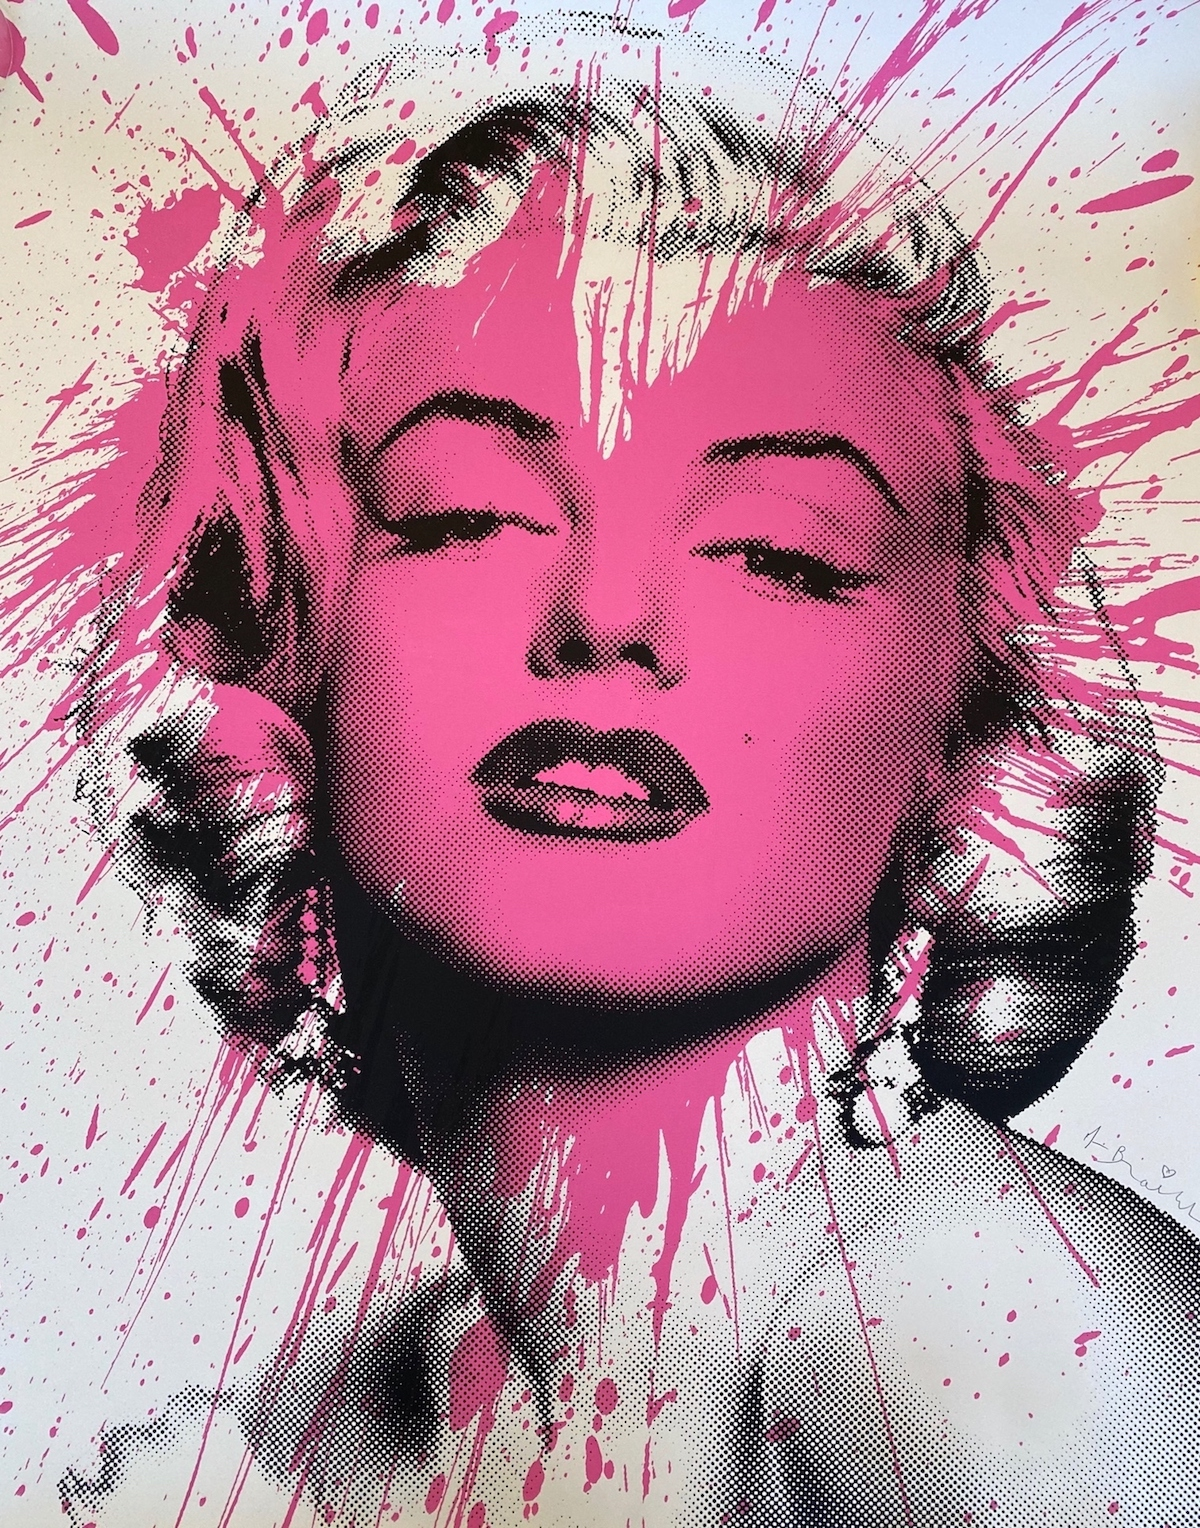 My Heart is Yours (Marilyn Monroe) by Mr. Brainwash